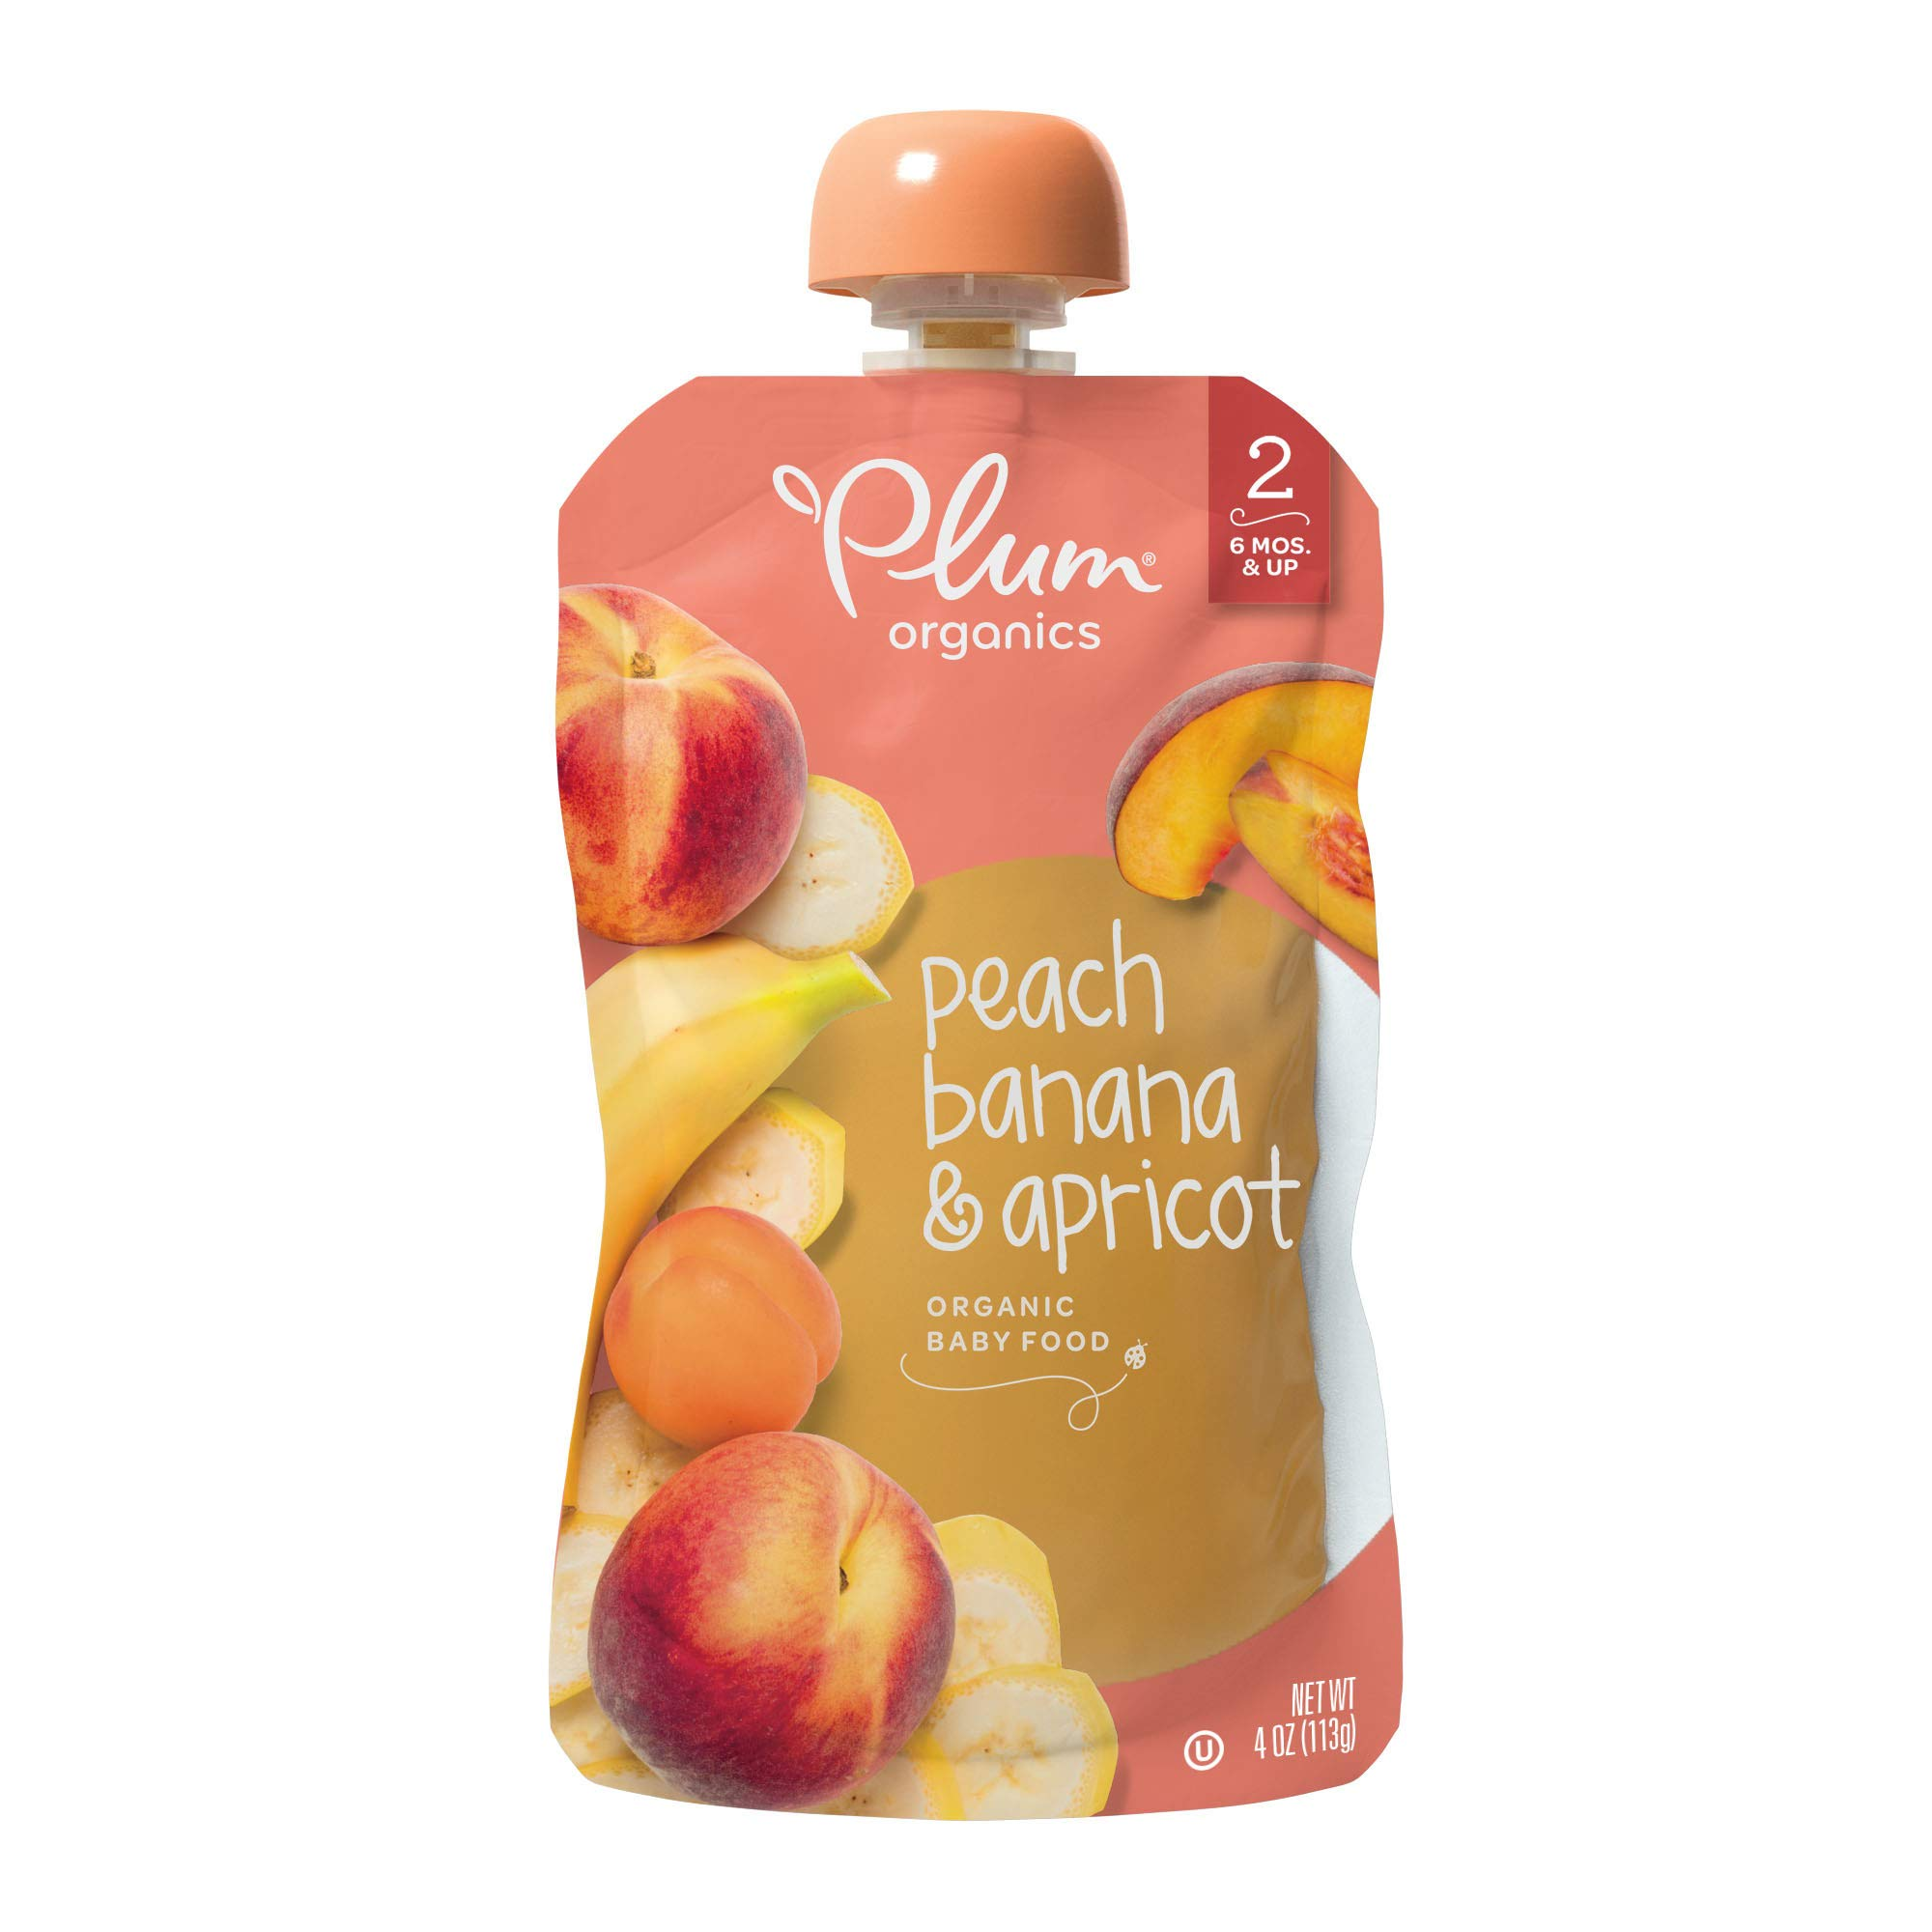 Plum Organics Stage 2, Organic Baby Food, Peach, Banana, and Apricot, 4.0 Ounce